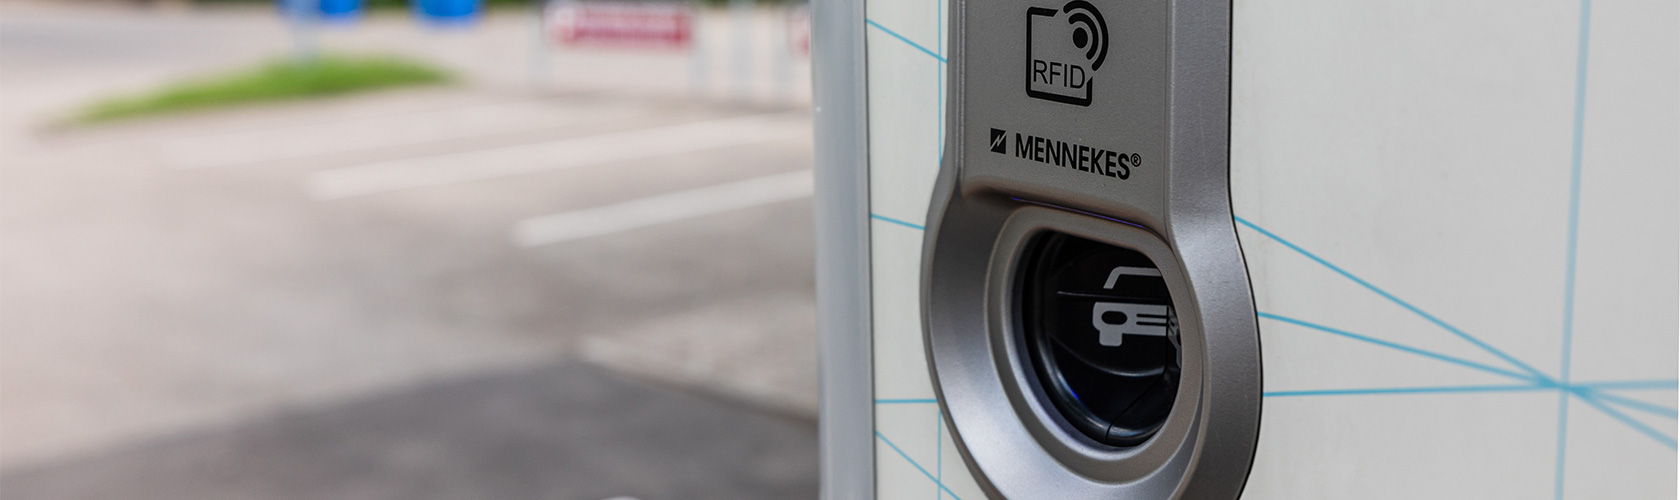 Ladestation Elektromobilität – GEO Energie Ostalb